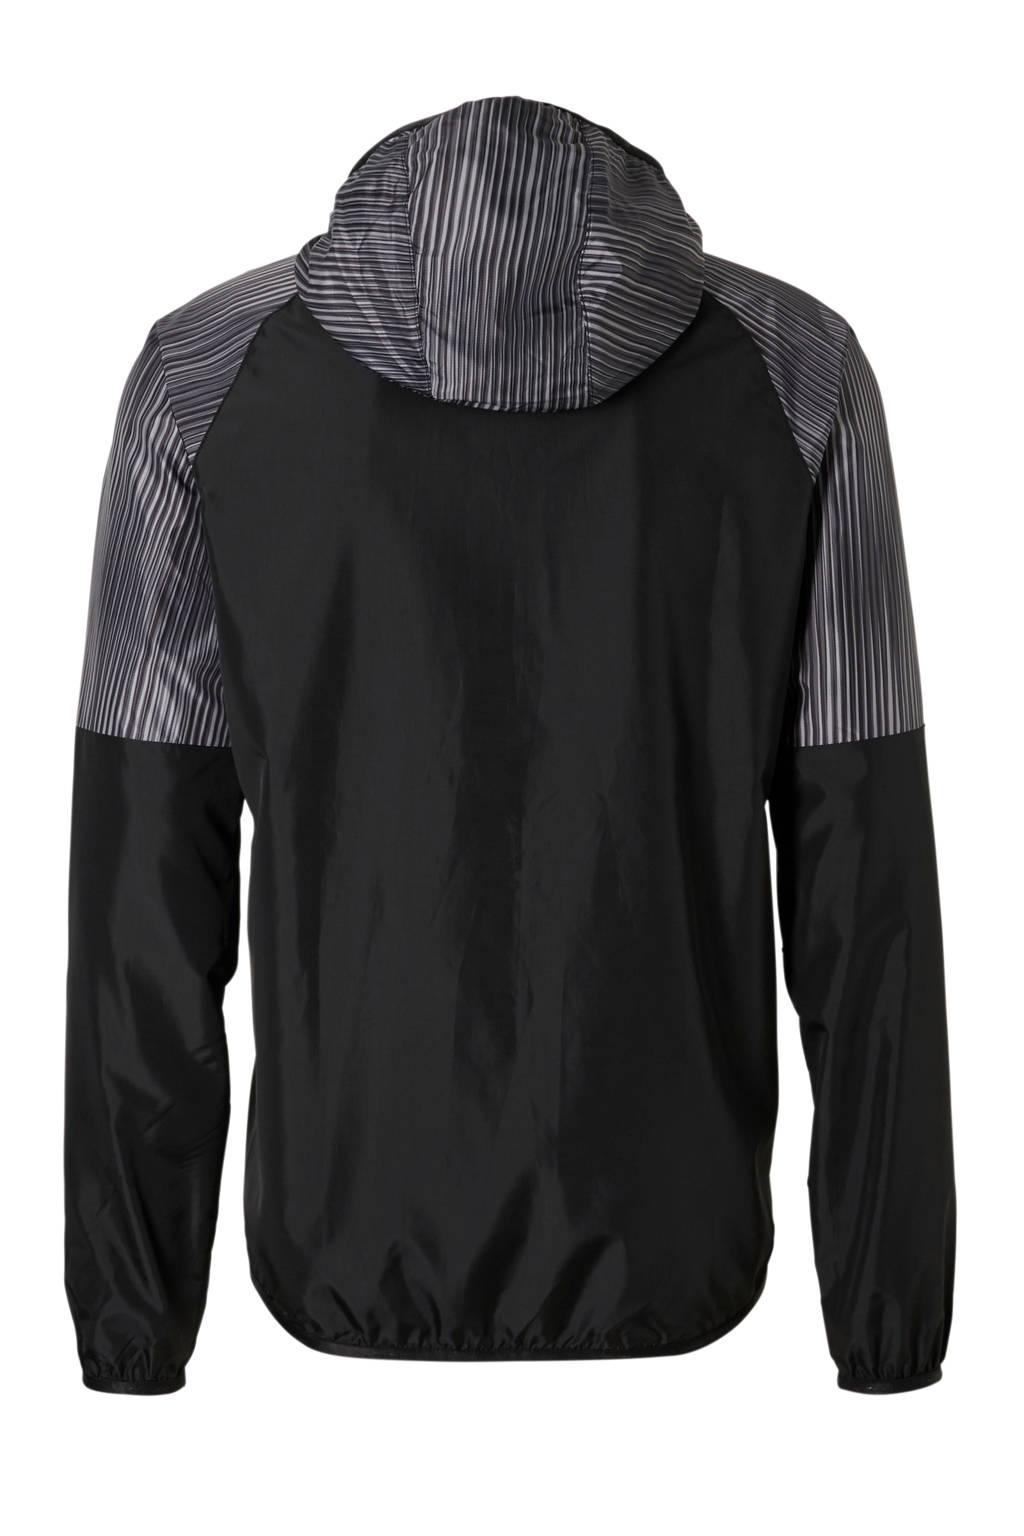 Mizuno sportjack waterafstotend zwart, Zwart/grijs/rood